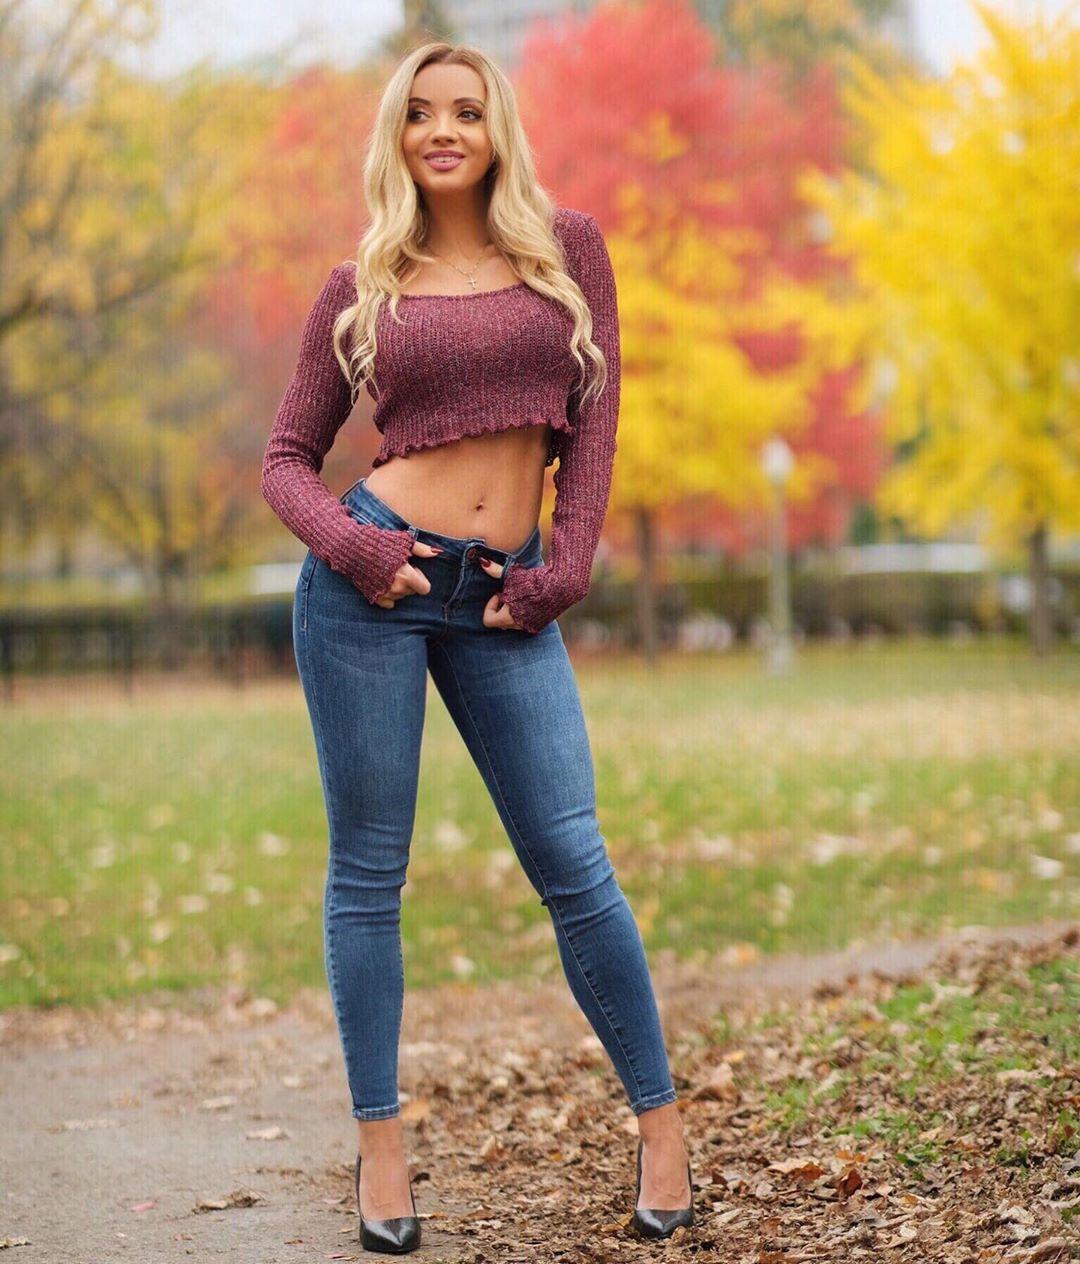 Yulia-Kay-Wallpapers-Insta-Fit-Bio-6